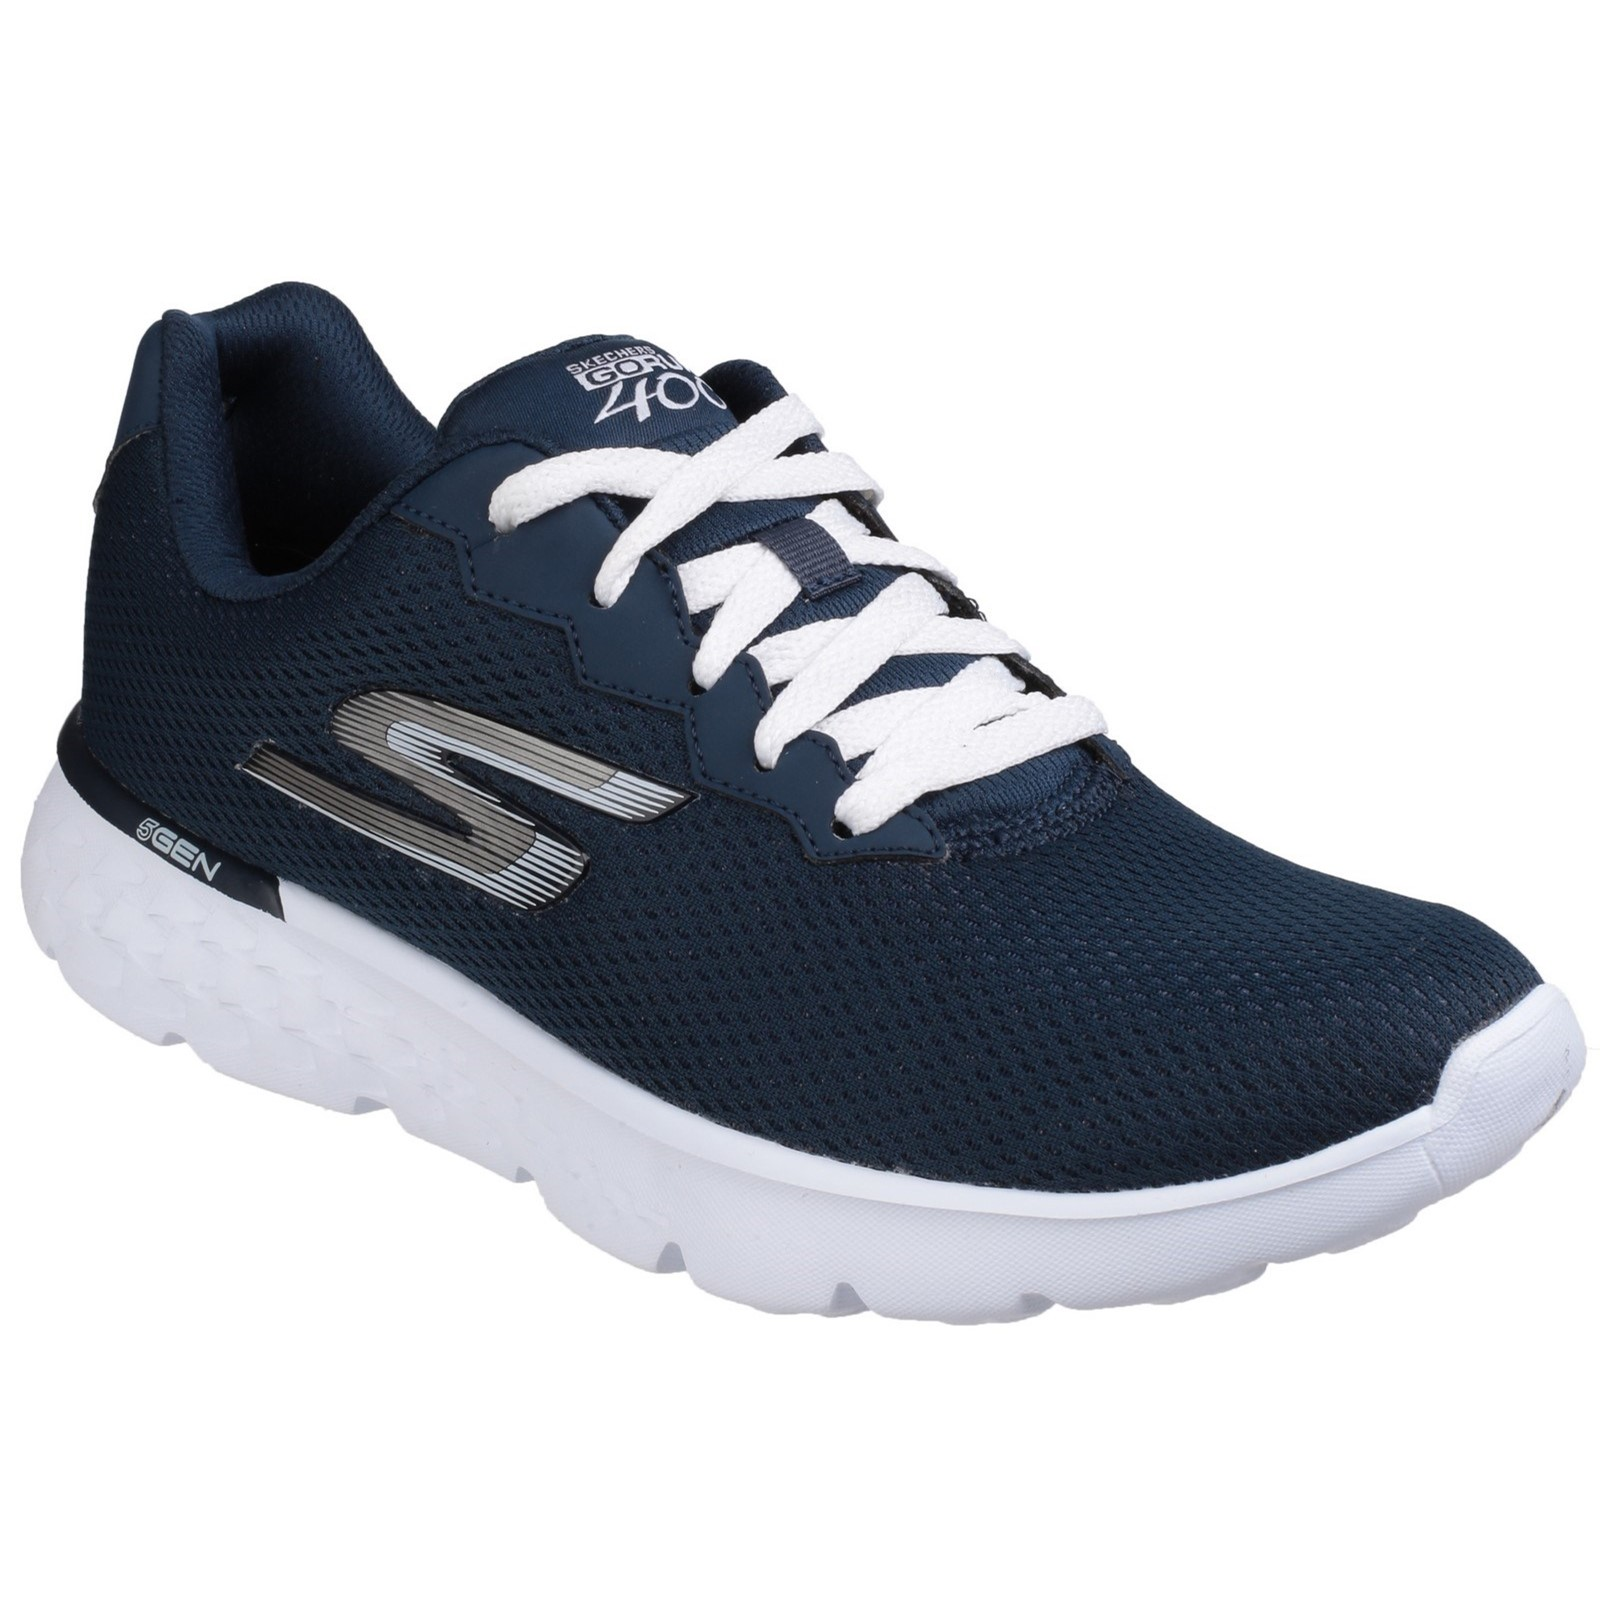 Skchers donna  Go Run 400 Action Cordones Calzado Deportivo blu Marino biancao  prezzo basso